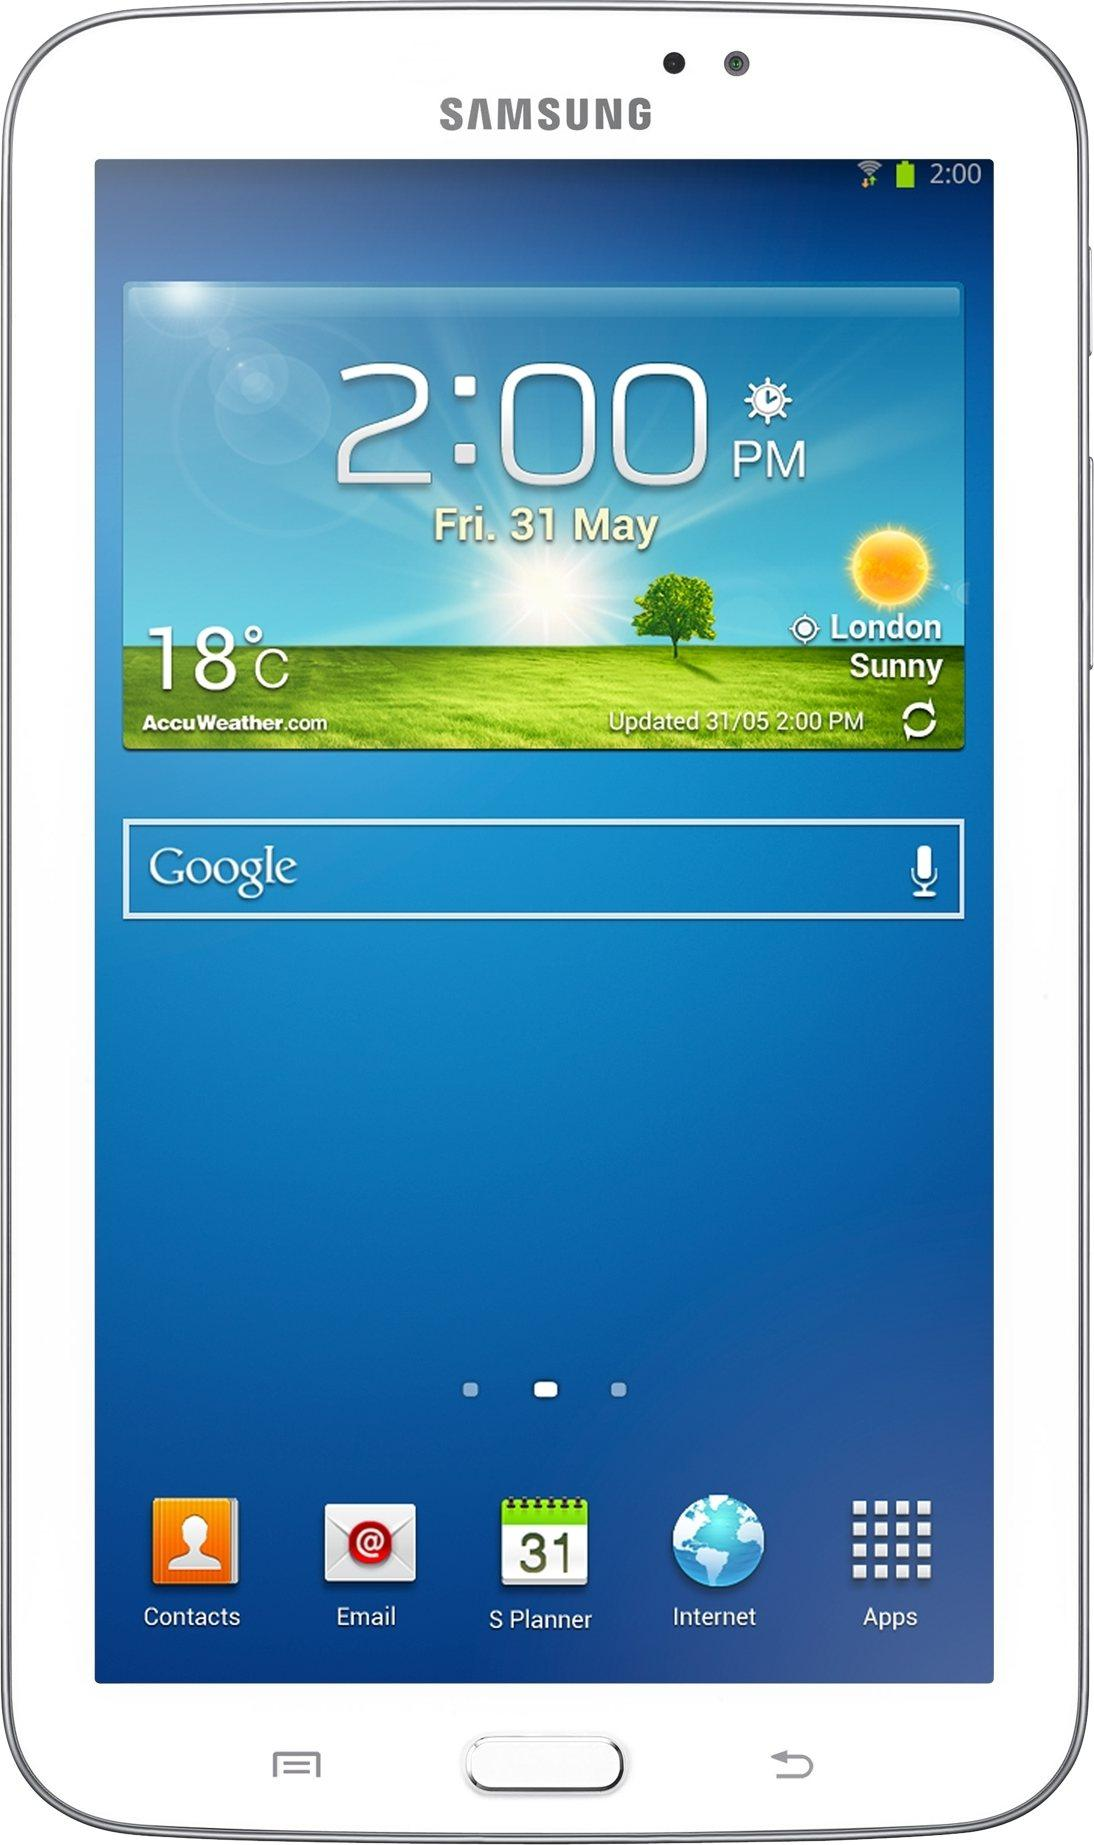 Galaxy Tab 3 7.0 (WiFi) SM-T210